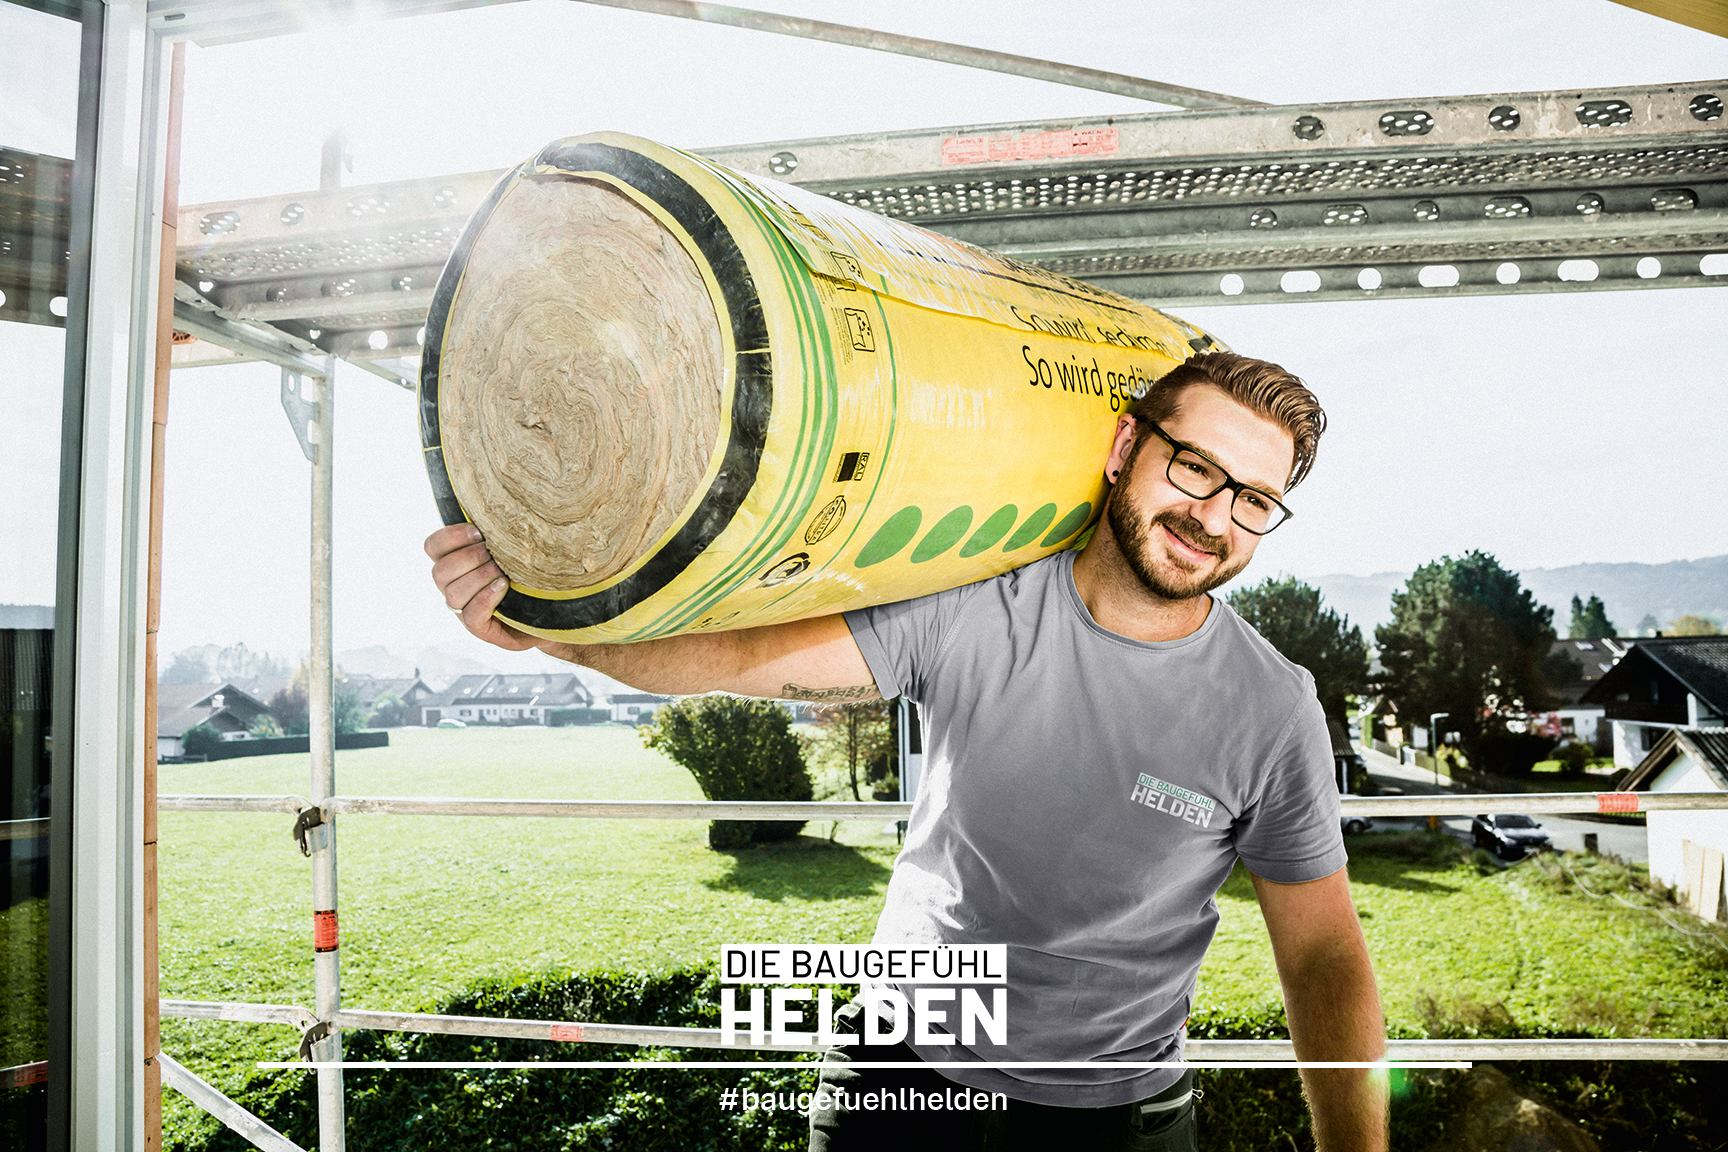 BAY_1810FS_Baugefuehlhelden_Trockenbau_CMYK_RZ-1048_social.png